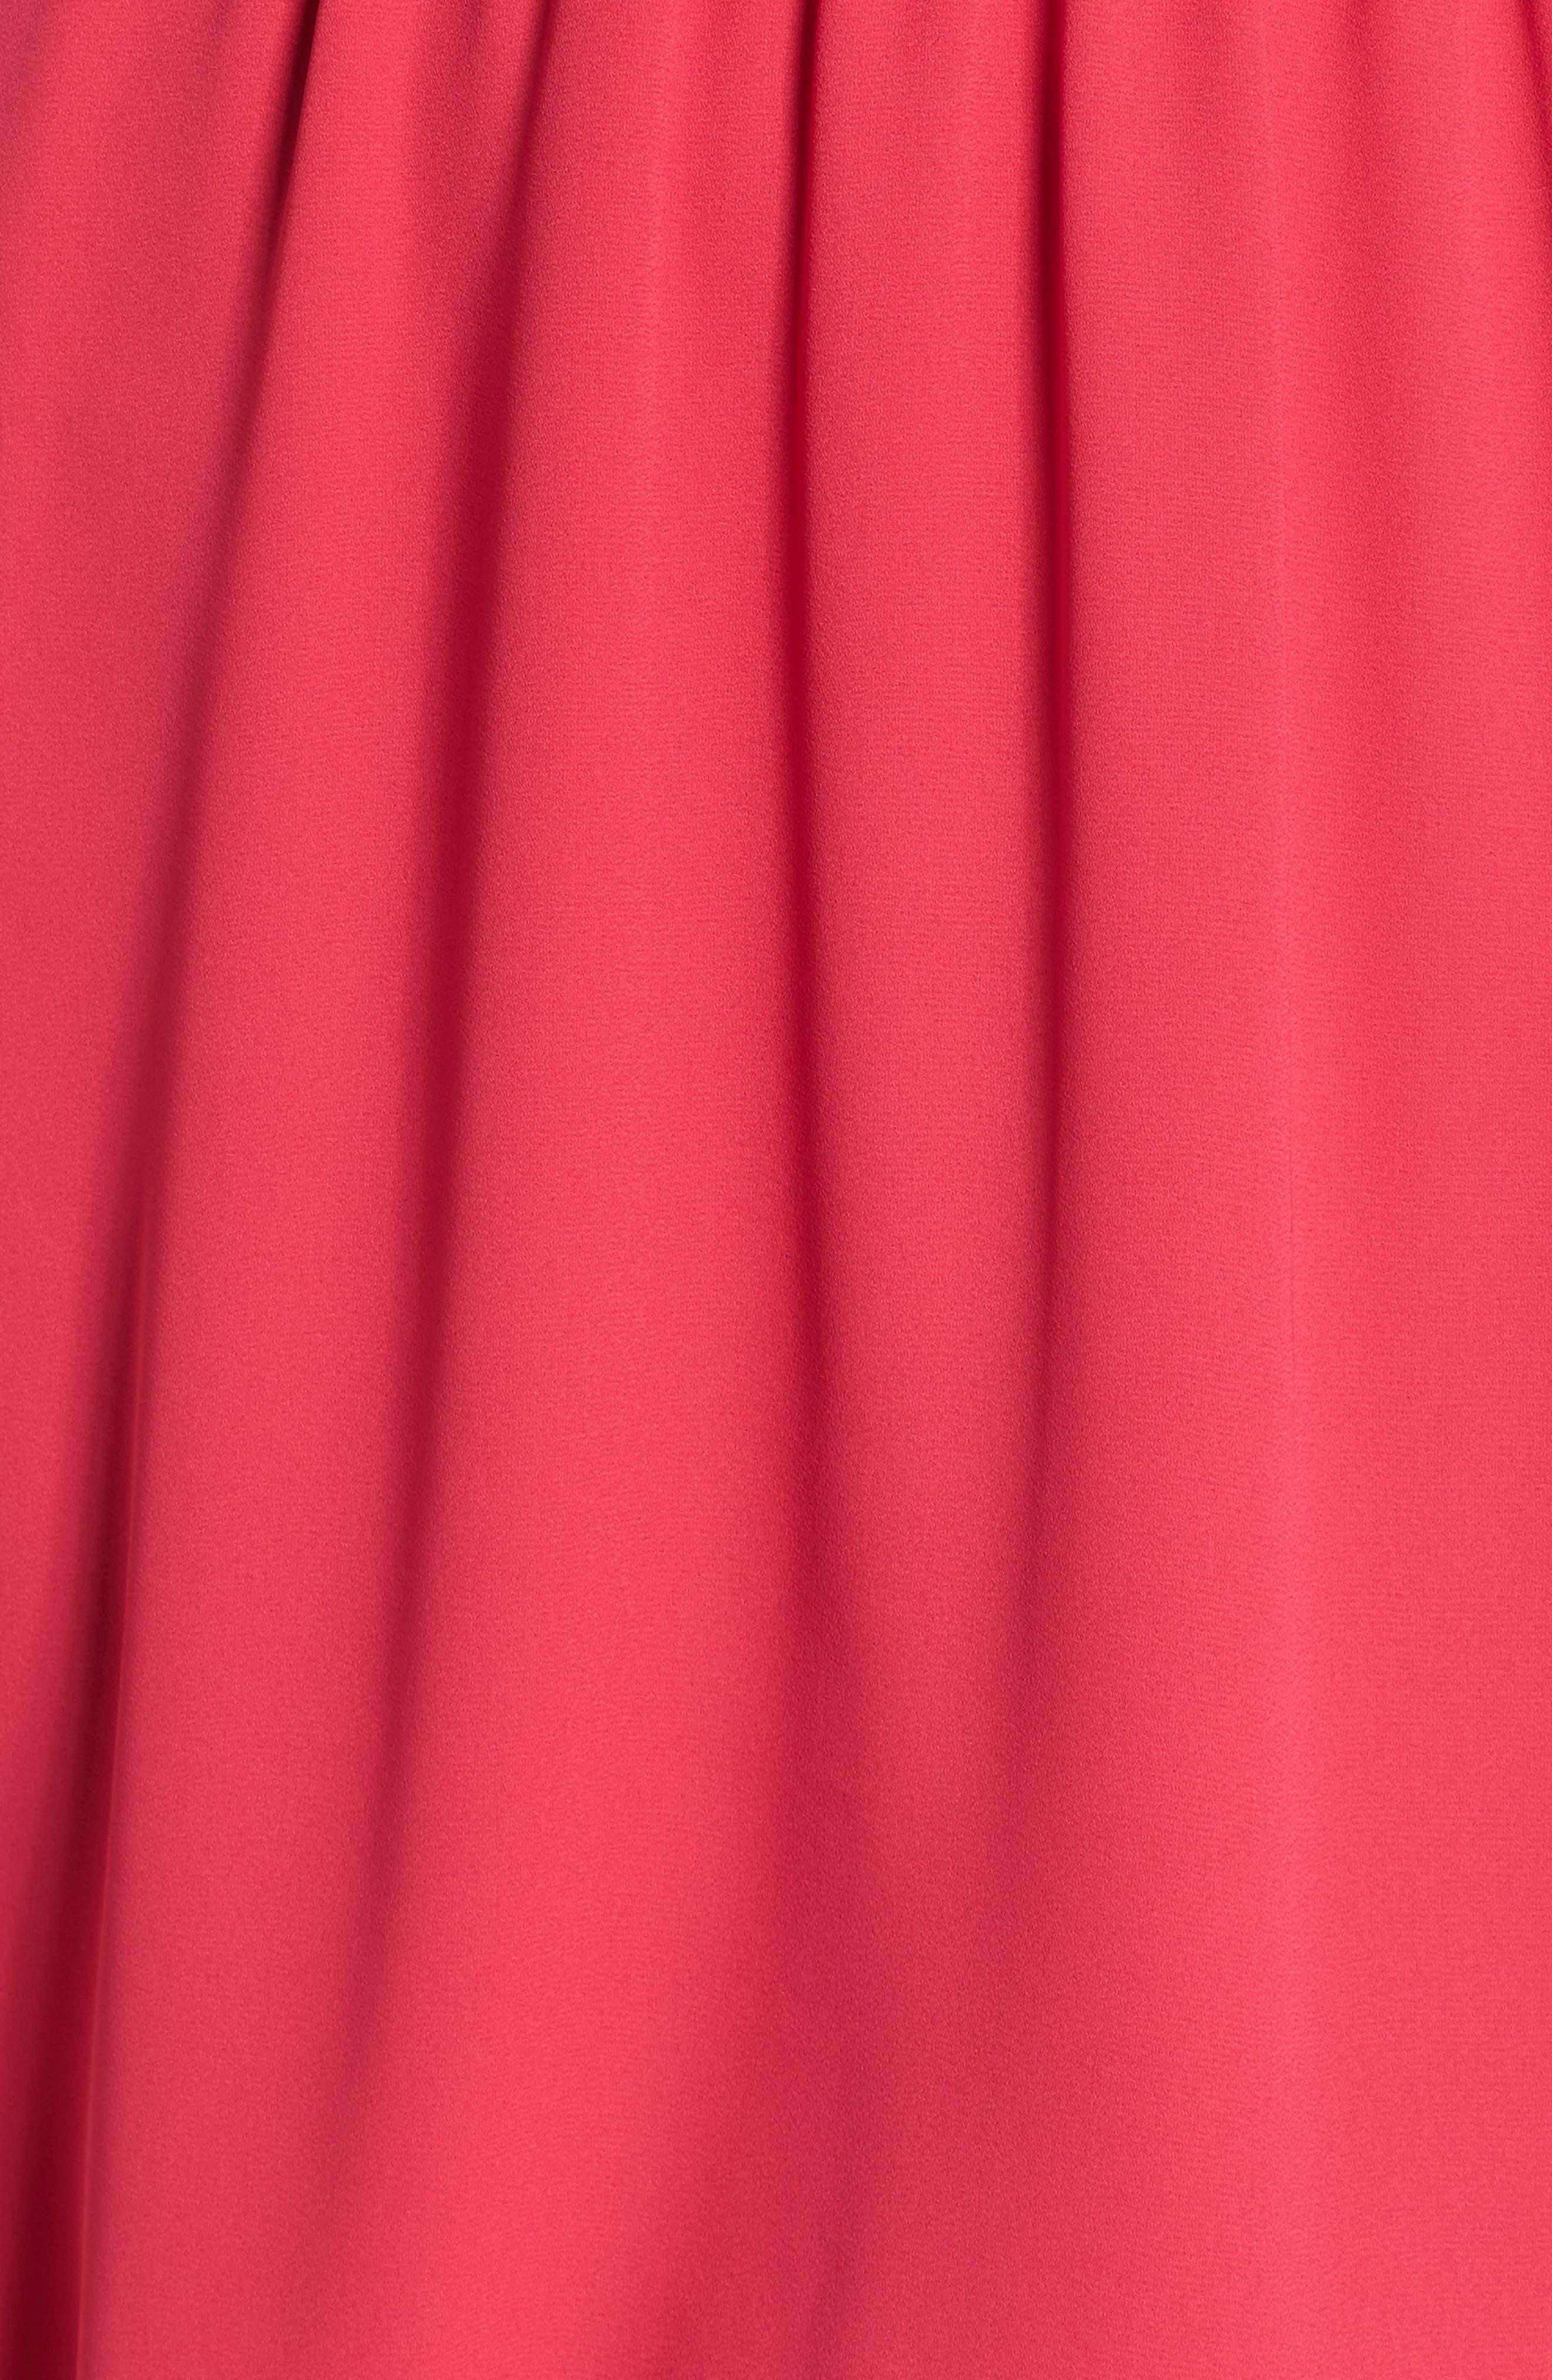 Blouson Chiffon Skater Dress,                             Alternate thumbnail 225, color,